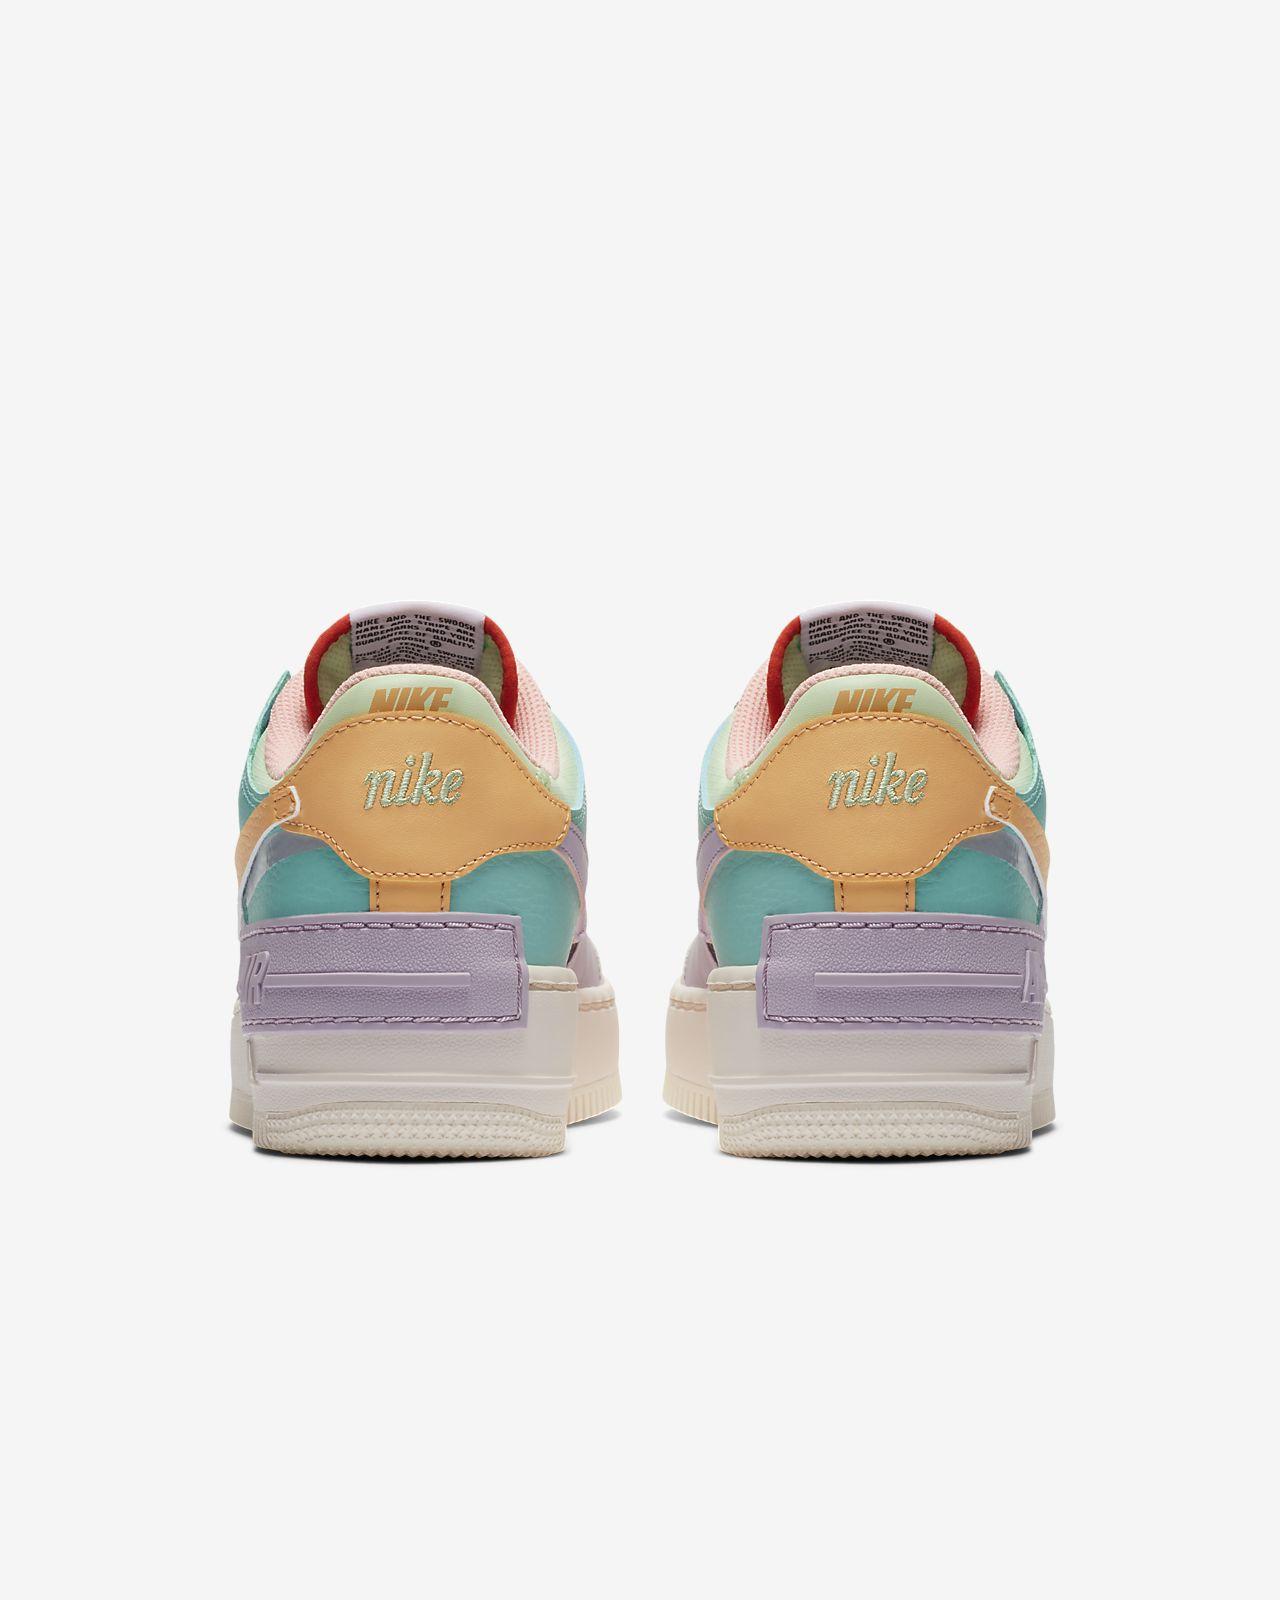 arrives latest design online retailer Nike Air Force 1 Shadow Women's Shoe